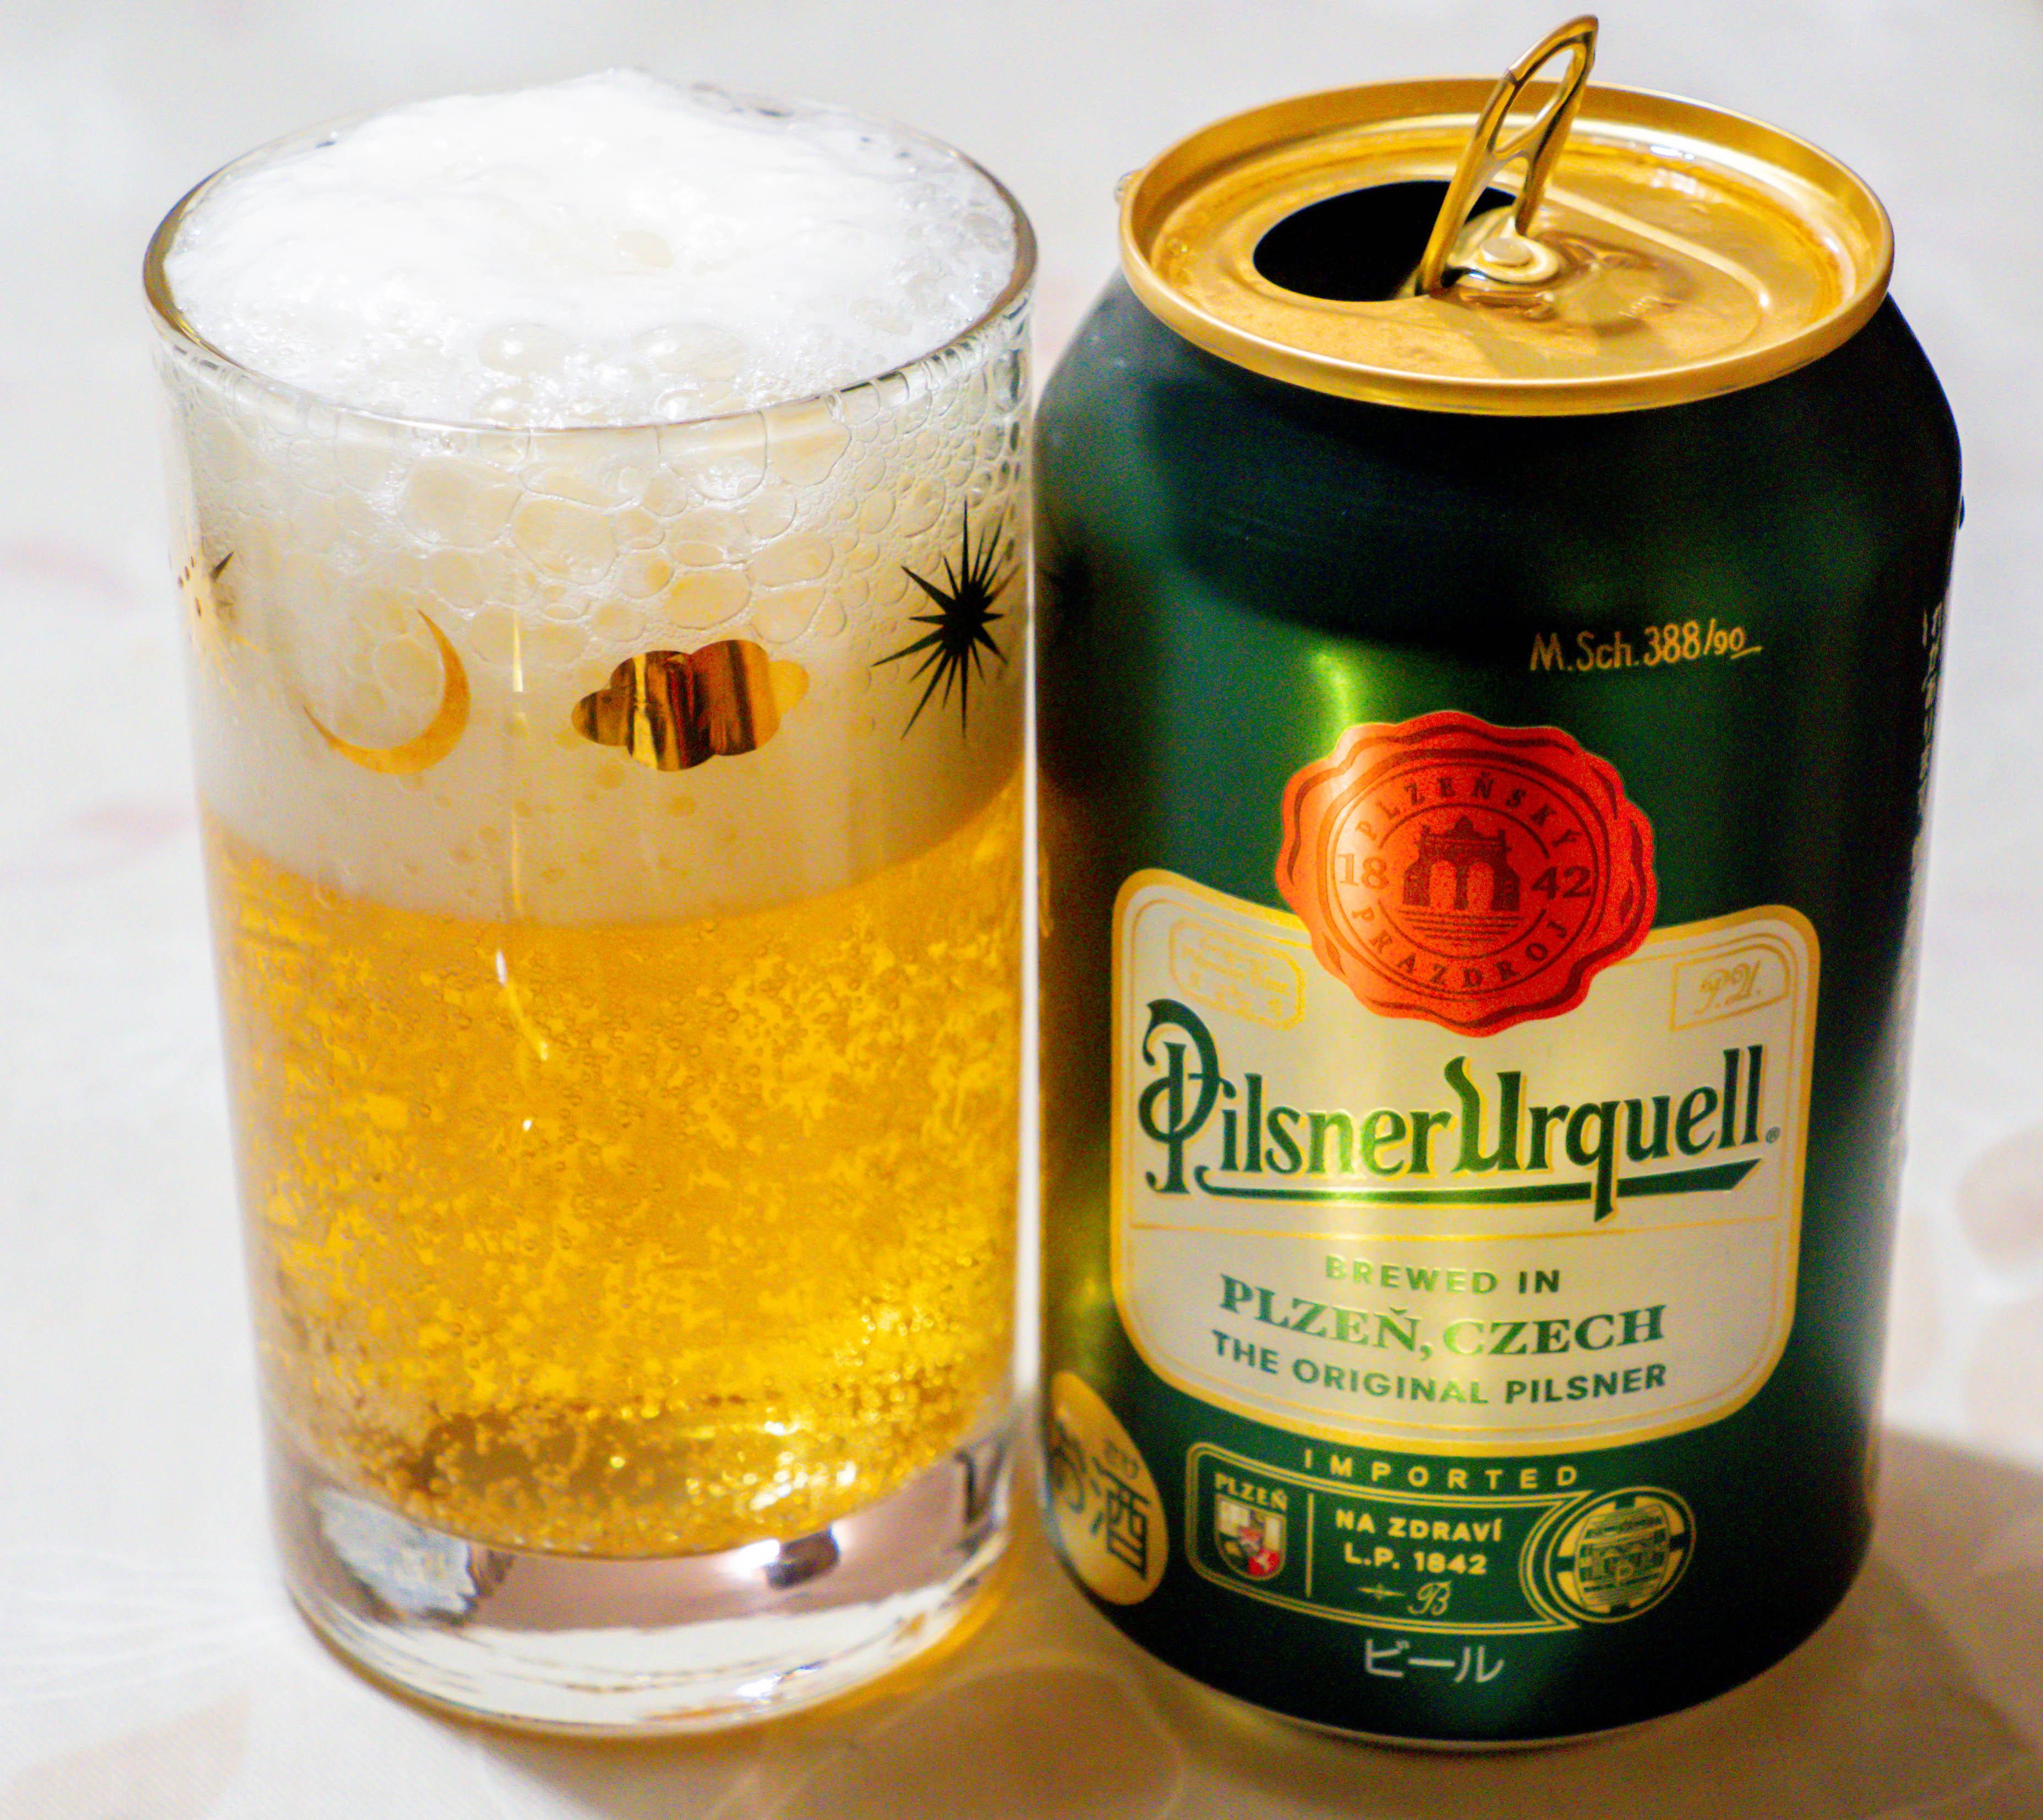 NewDaysで期間限定再発売のピルスナーウルケル缶 でNA ZDRAVÍ ! #チェコ親善アンバサダー